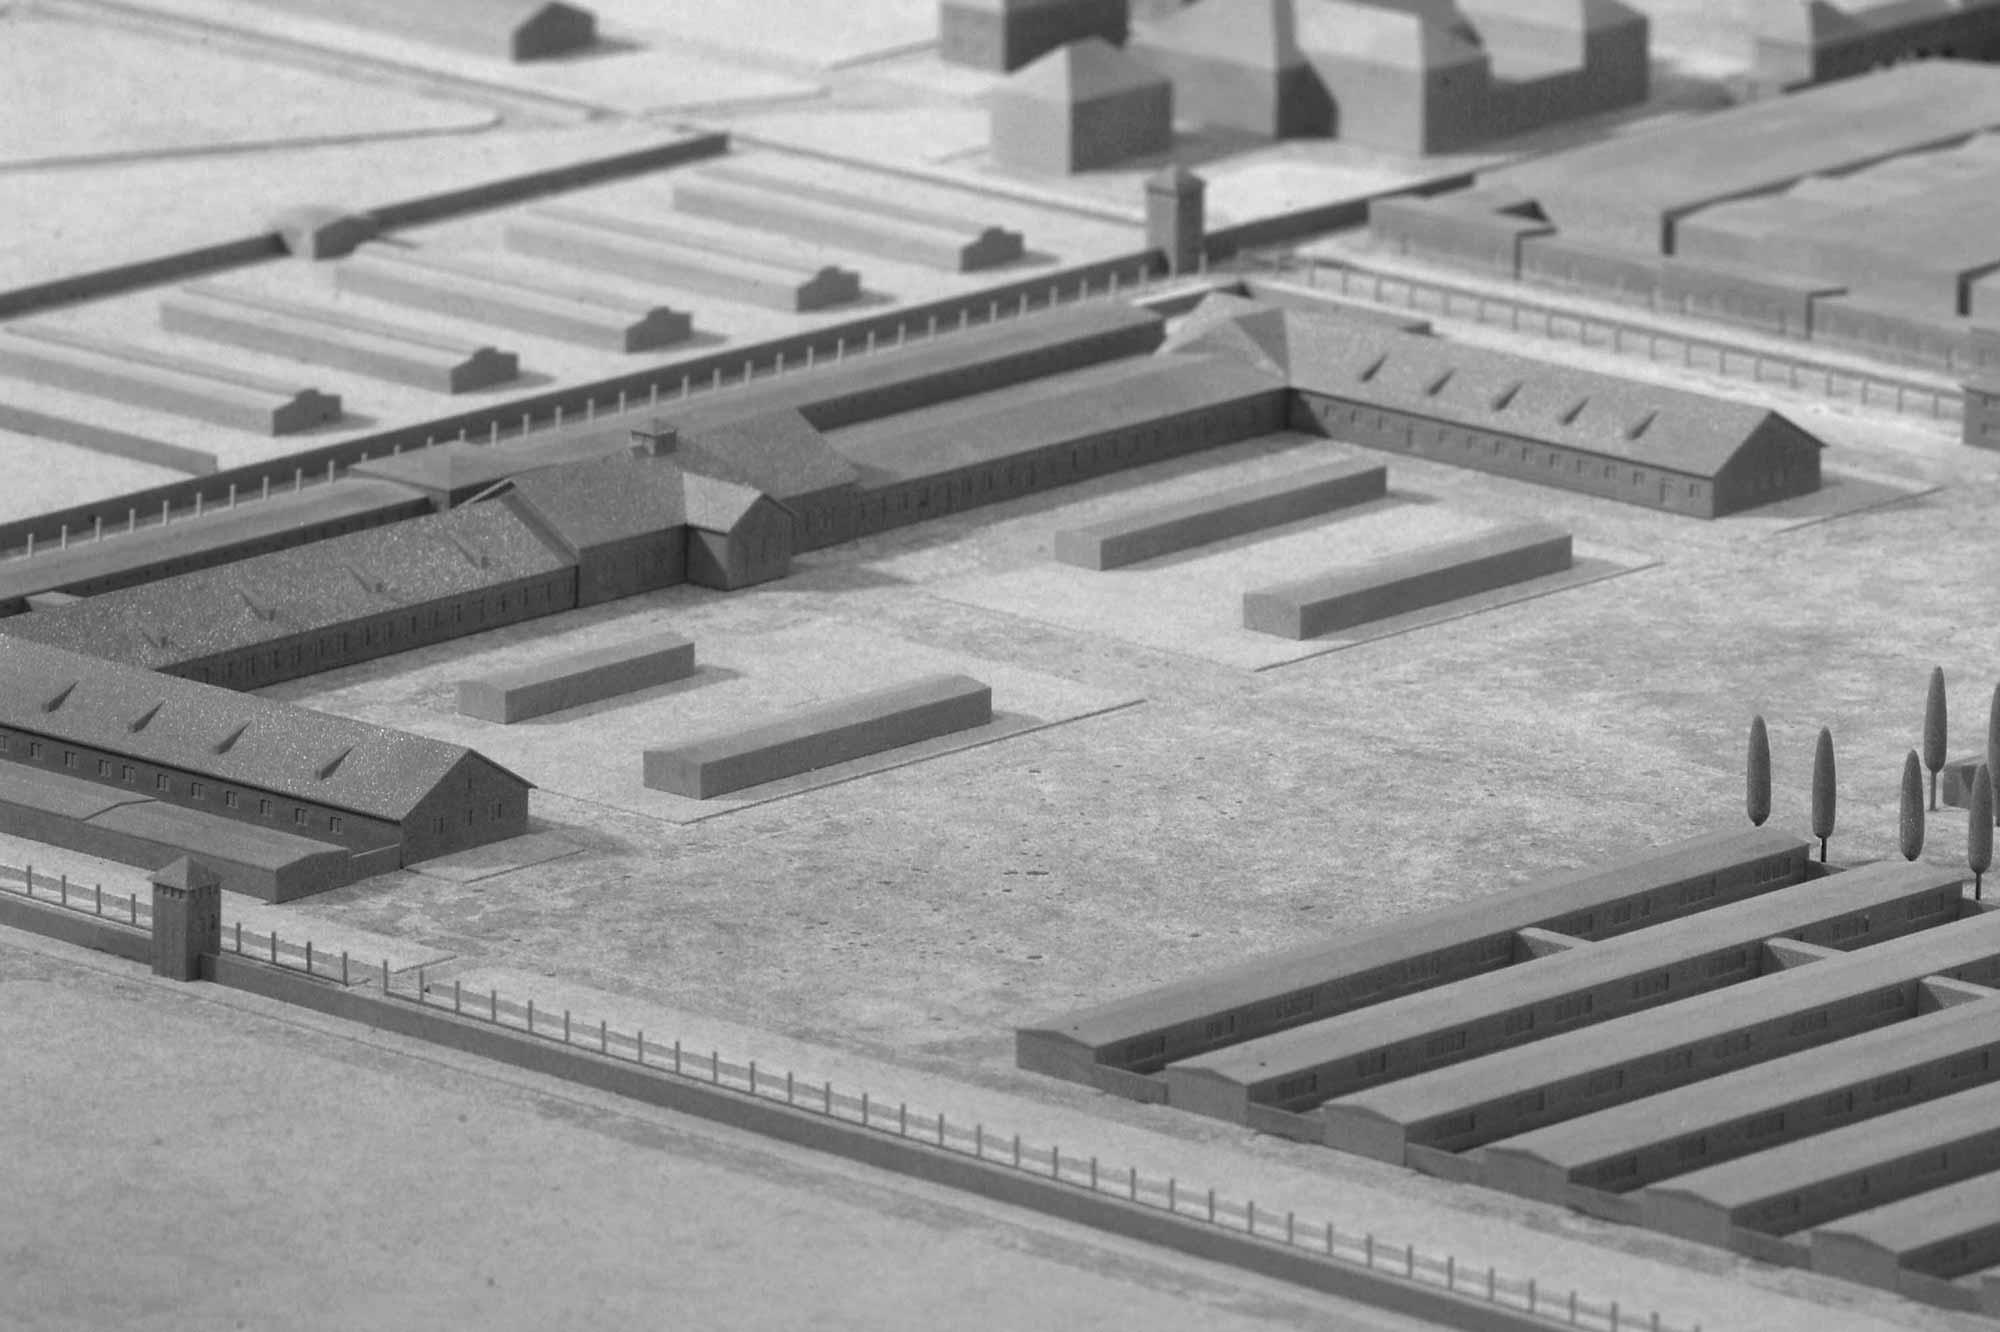 Modell KZ Dachau, das Häftlingslager